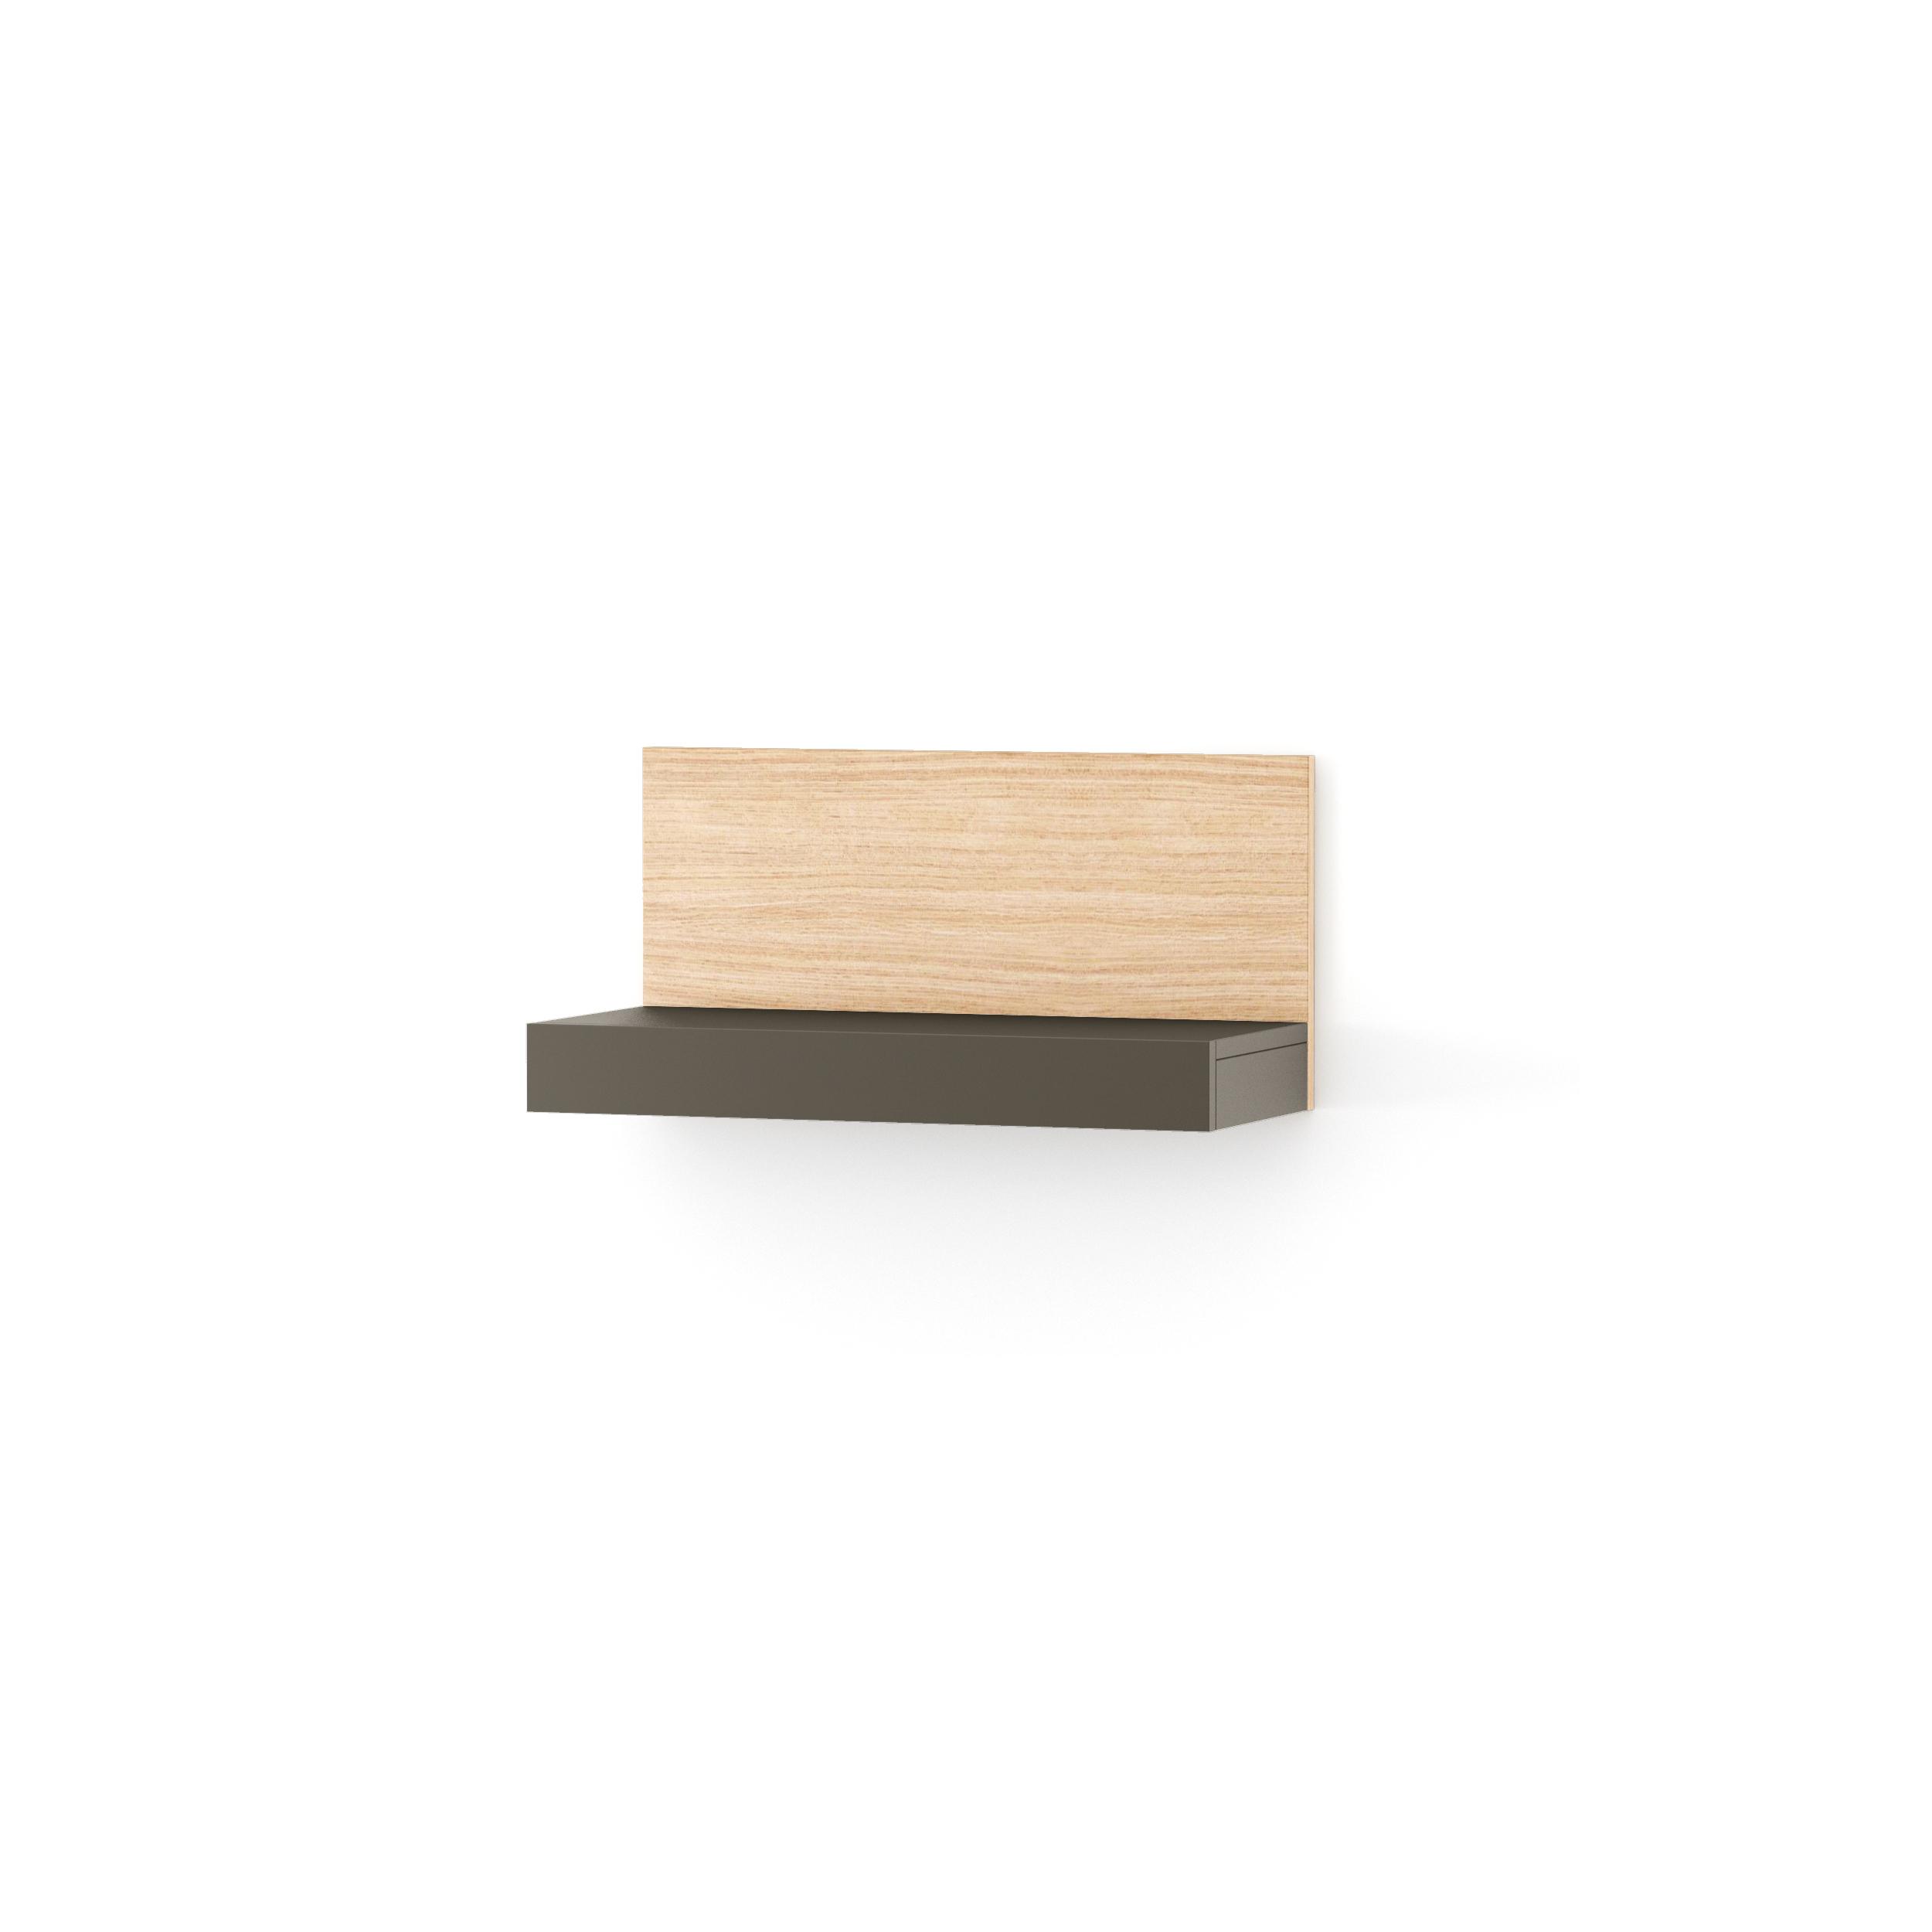 Etajera Nook Middle Oak Graphite  L65xl29xh32 Cm